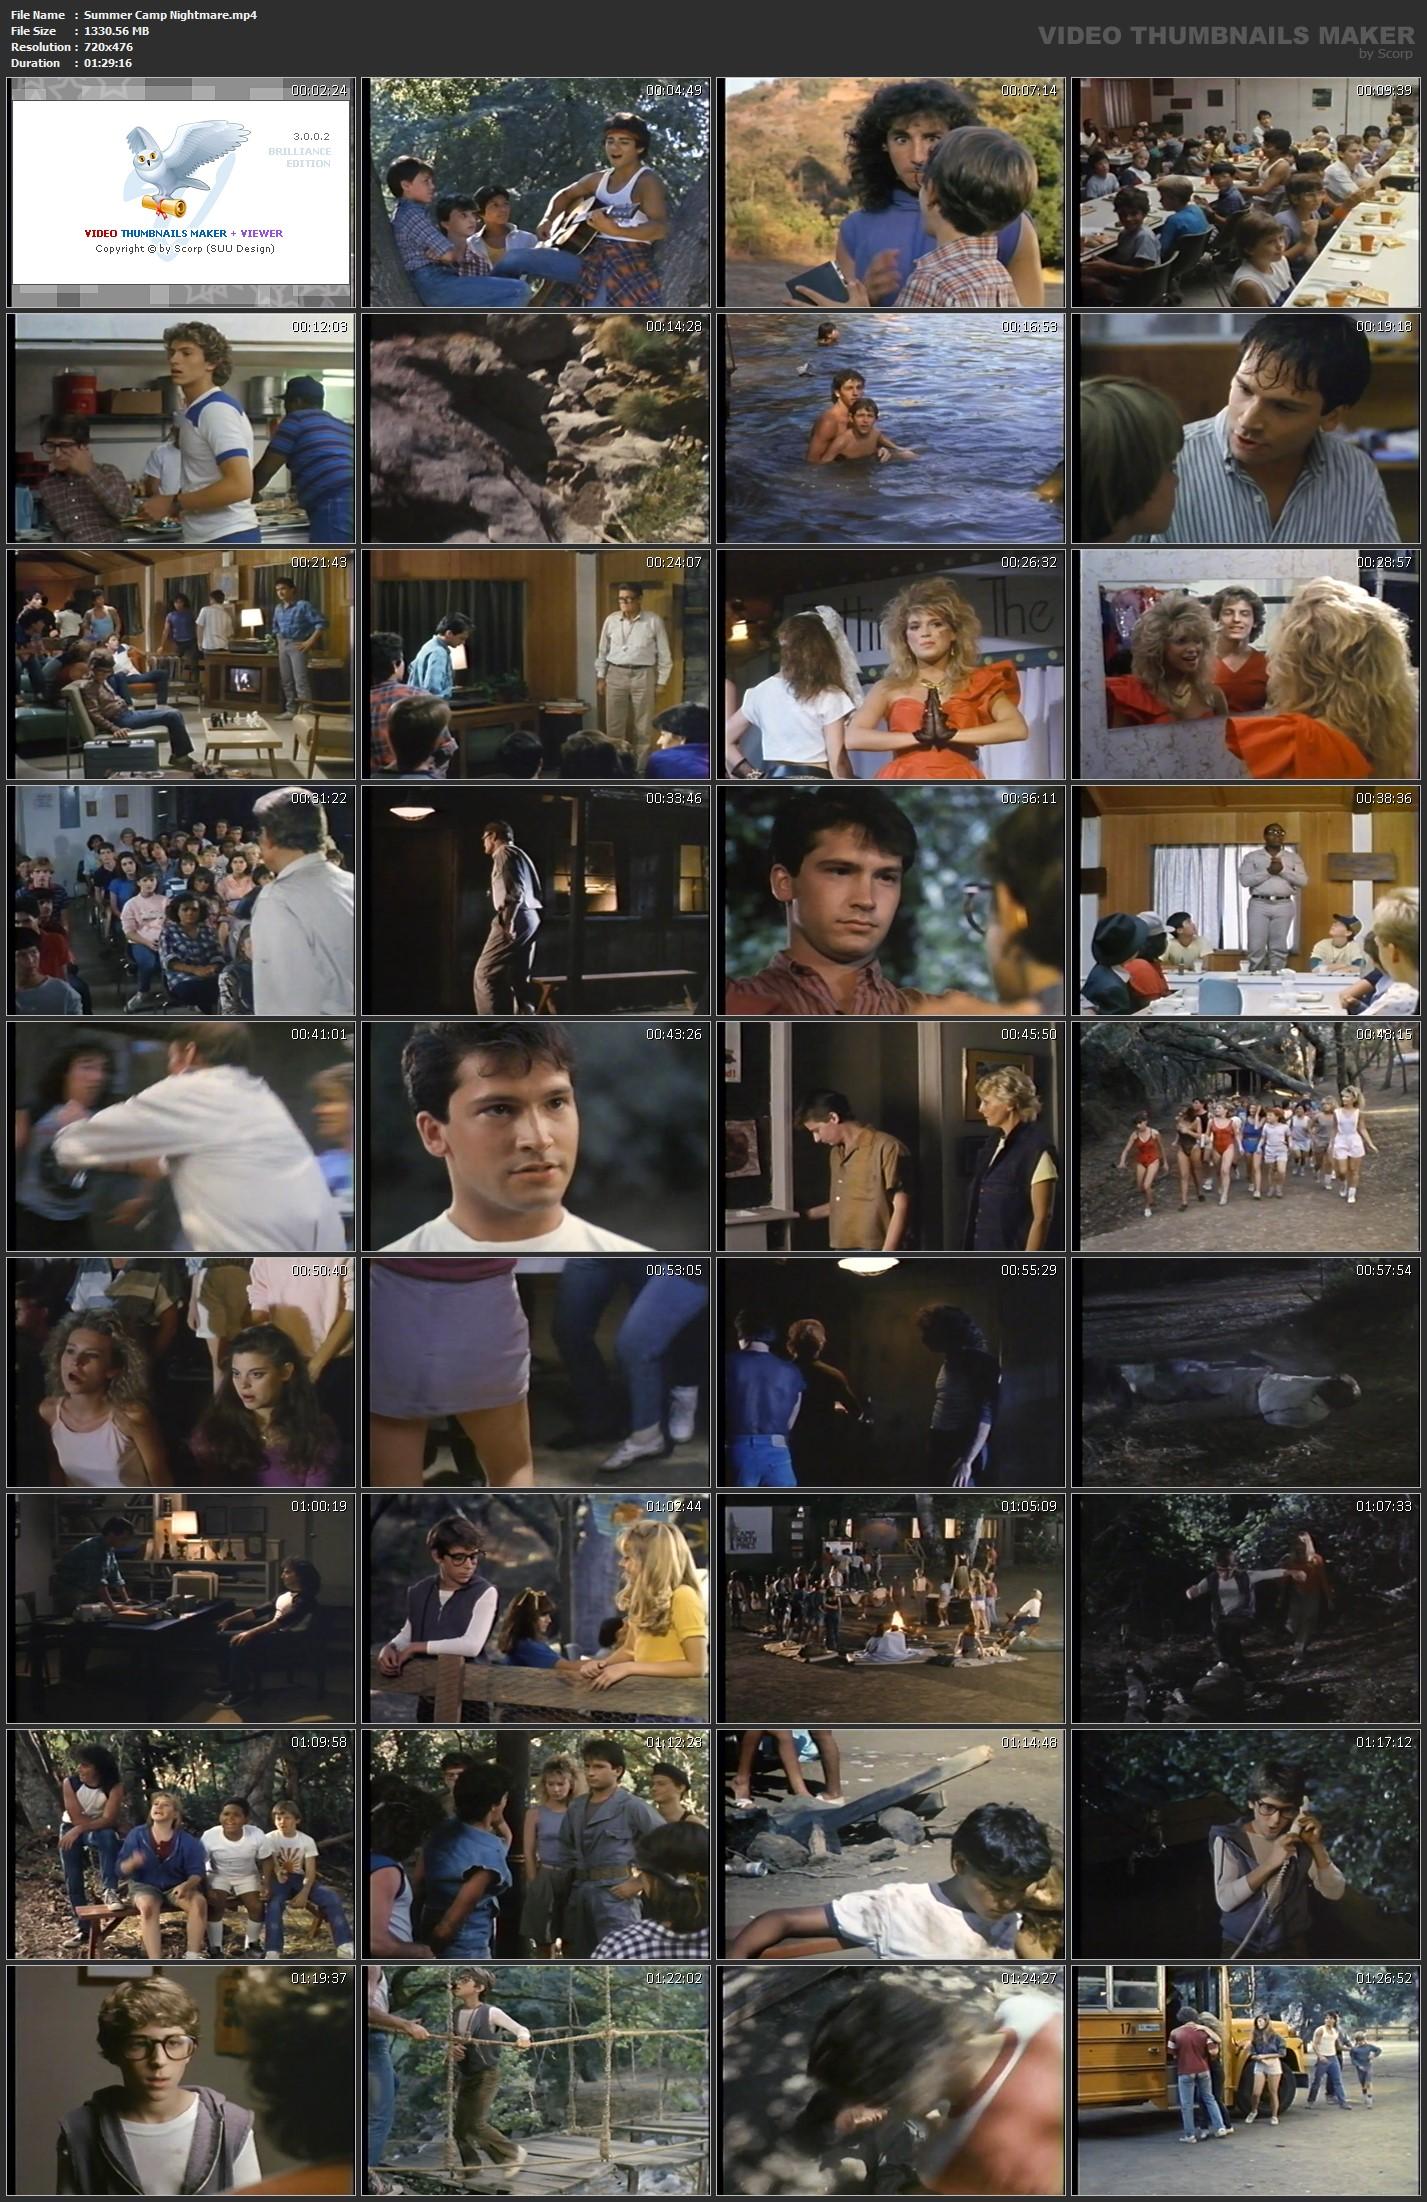 11 x 17 movie poster - summer camp nightmare